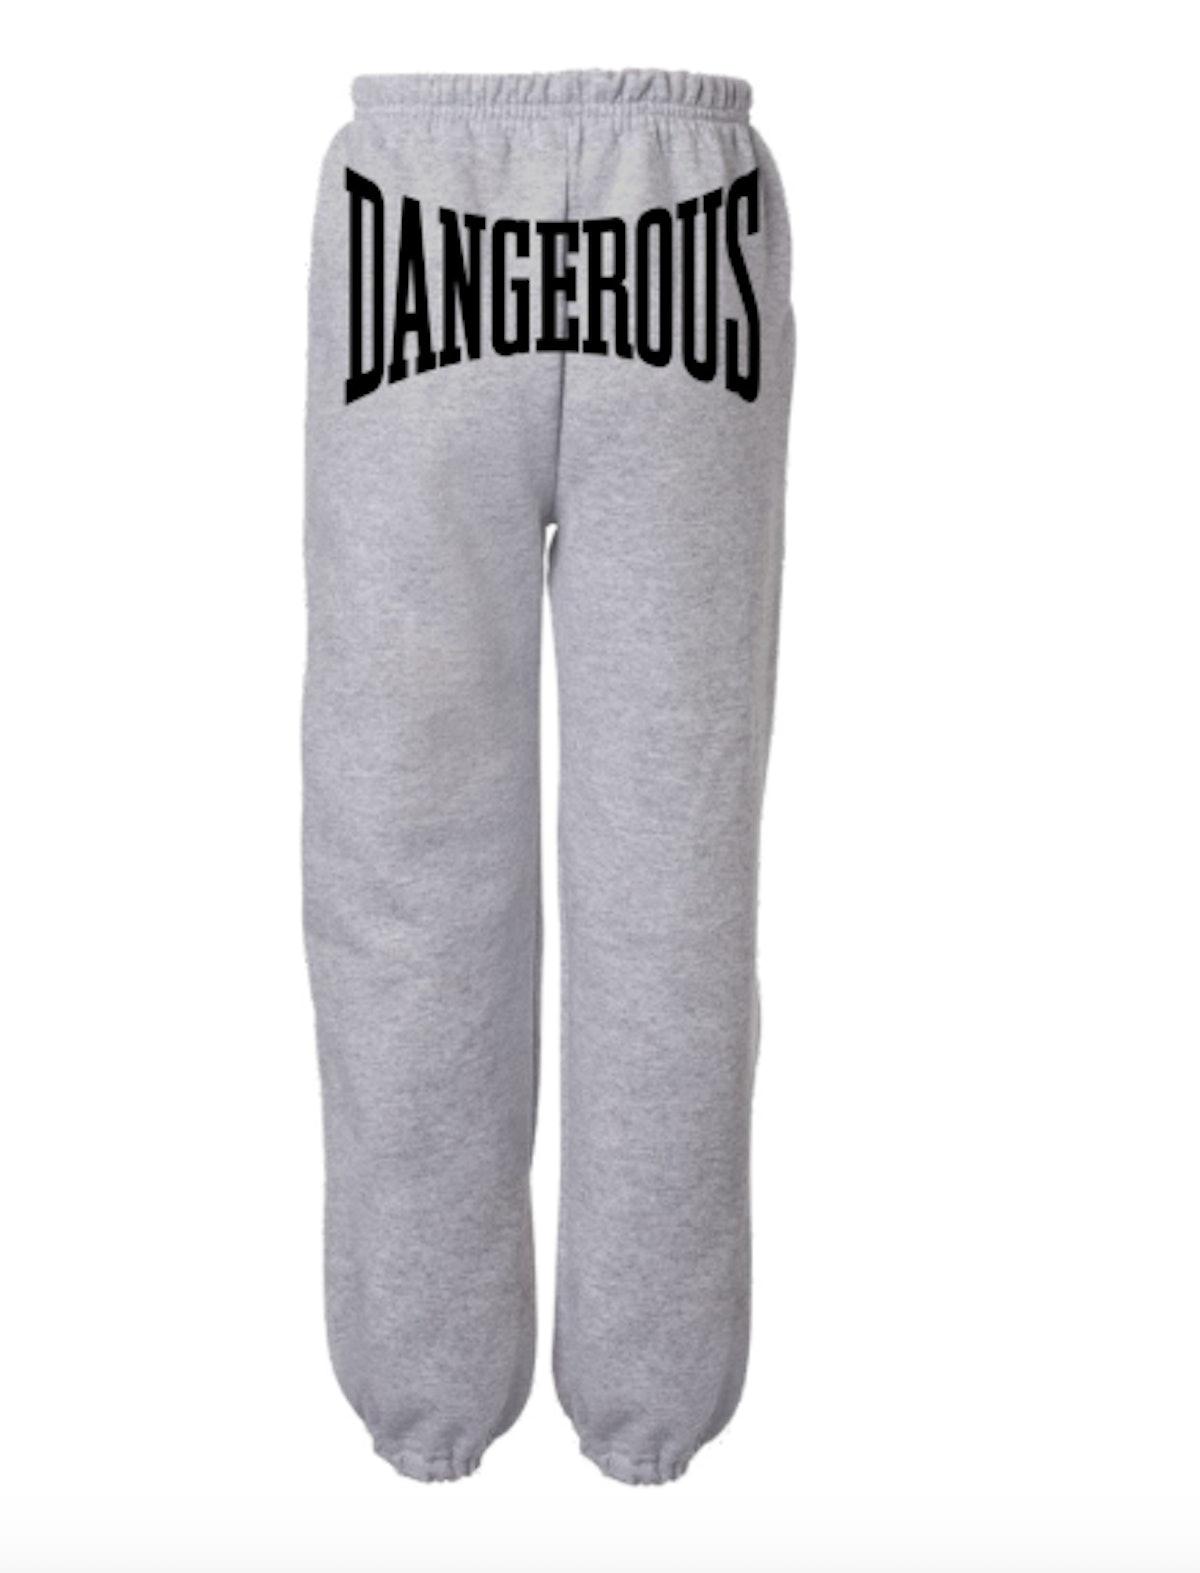 Dangerous Grey Sweatpants